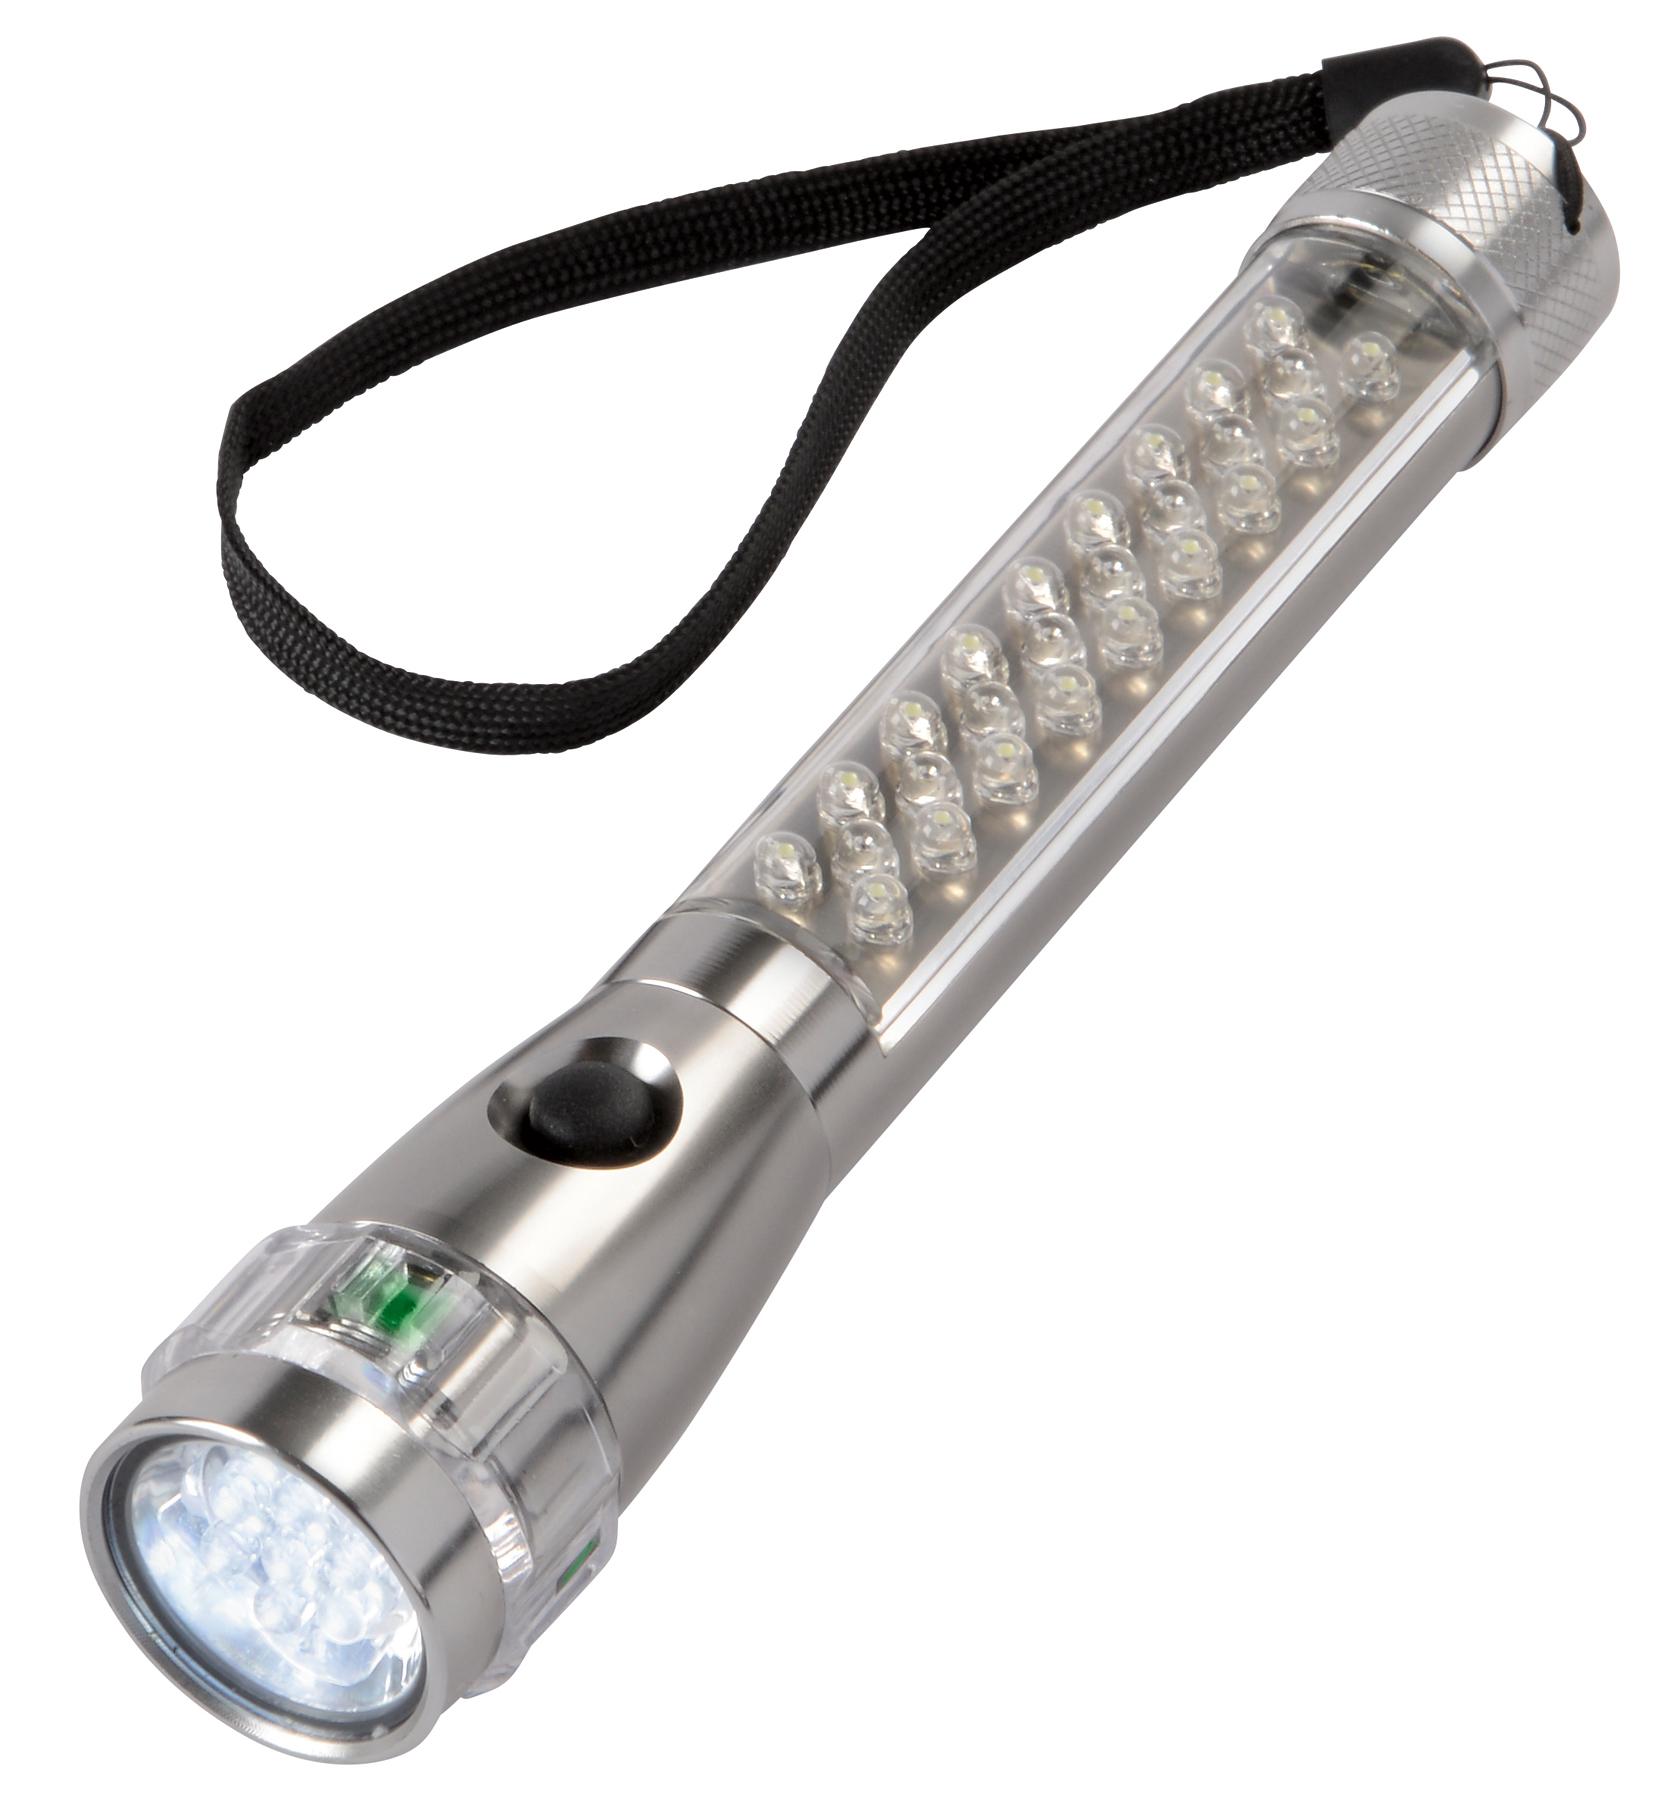 Latarka LED FLASH, antracytowy